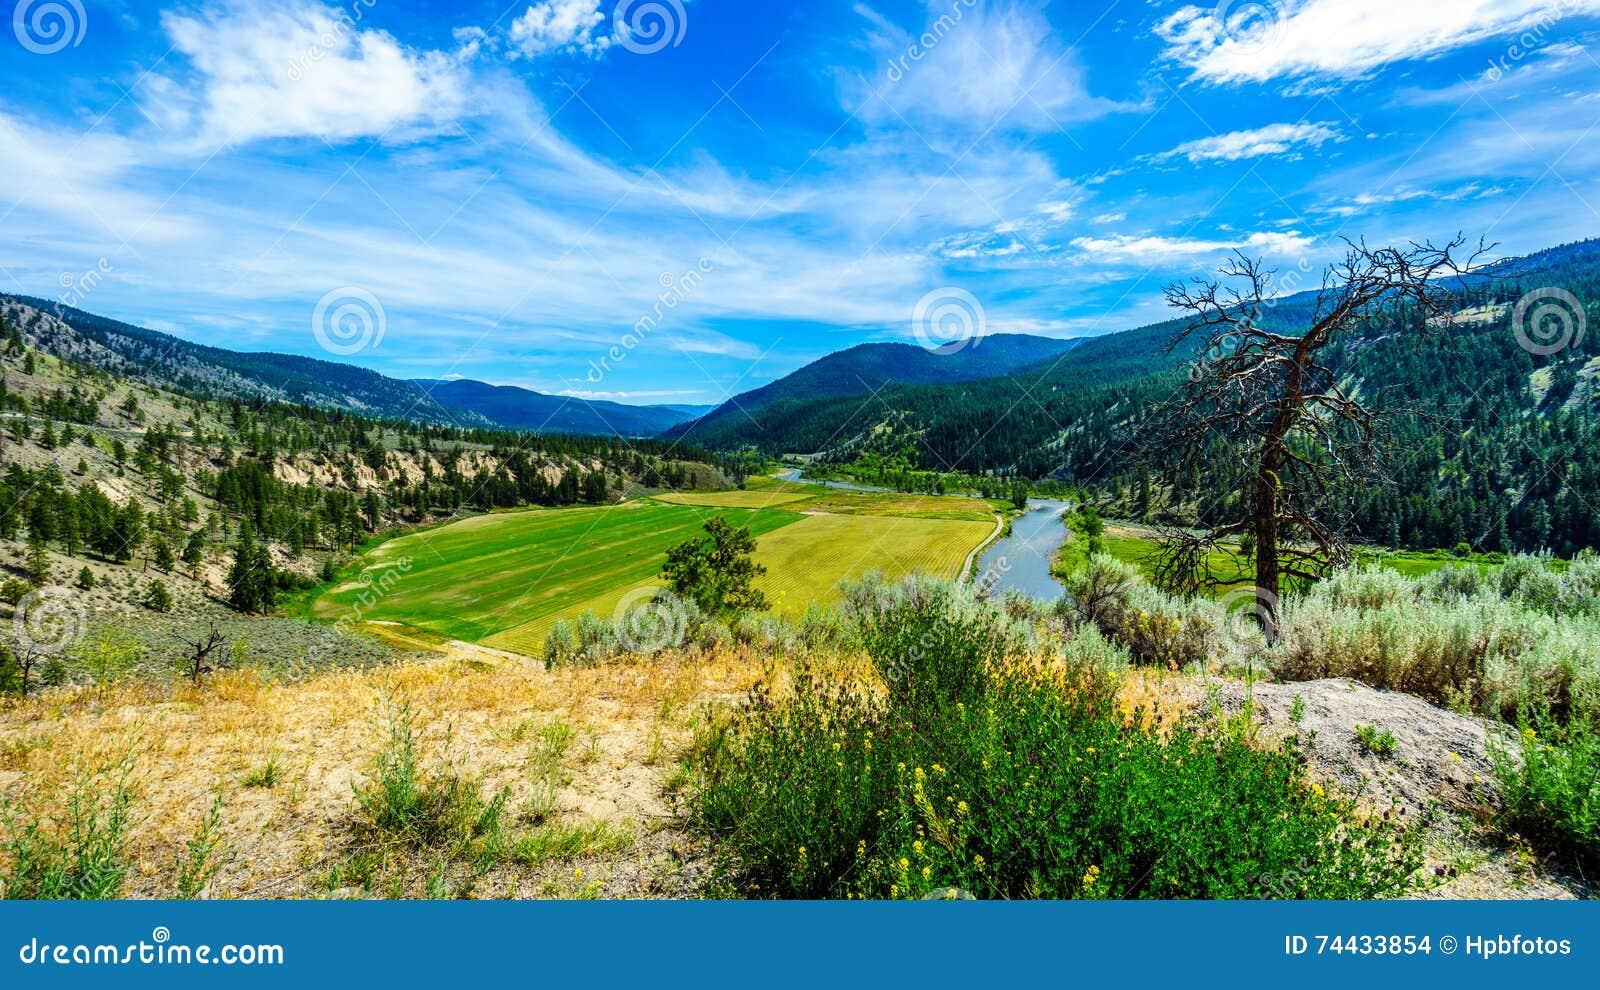 Fertile Farmland along the Nicola River between Merritt and Spences Bridge in British Columbia